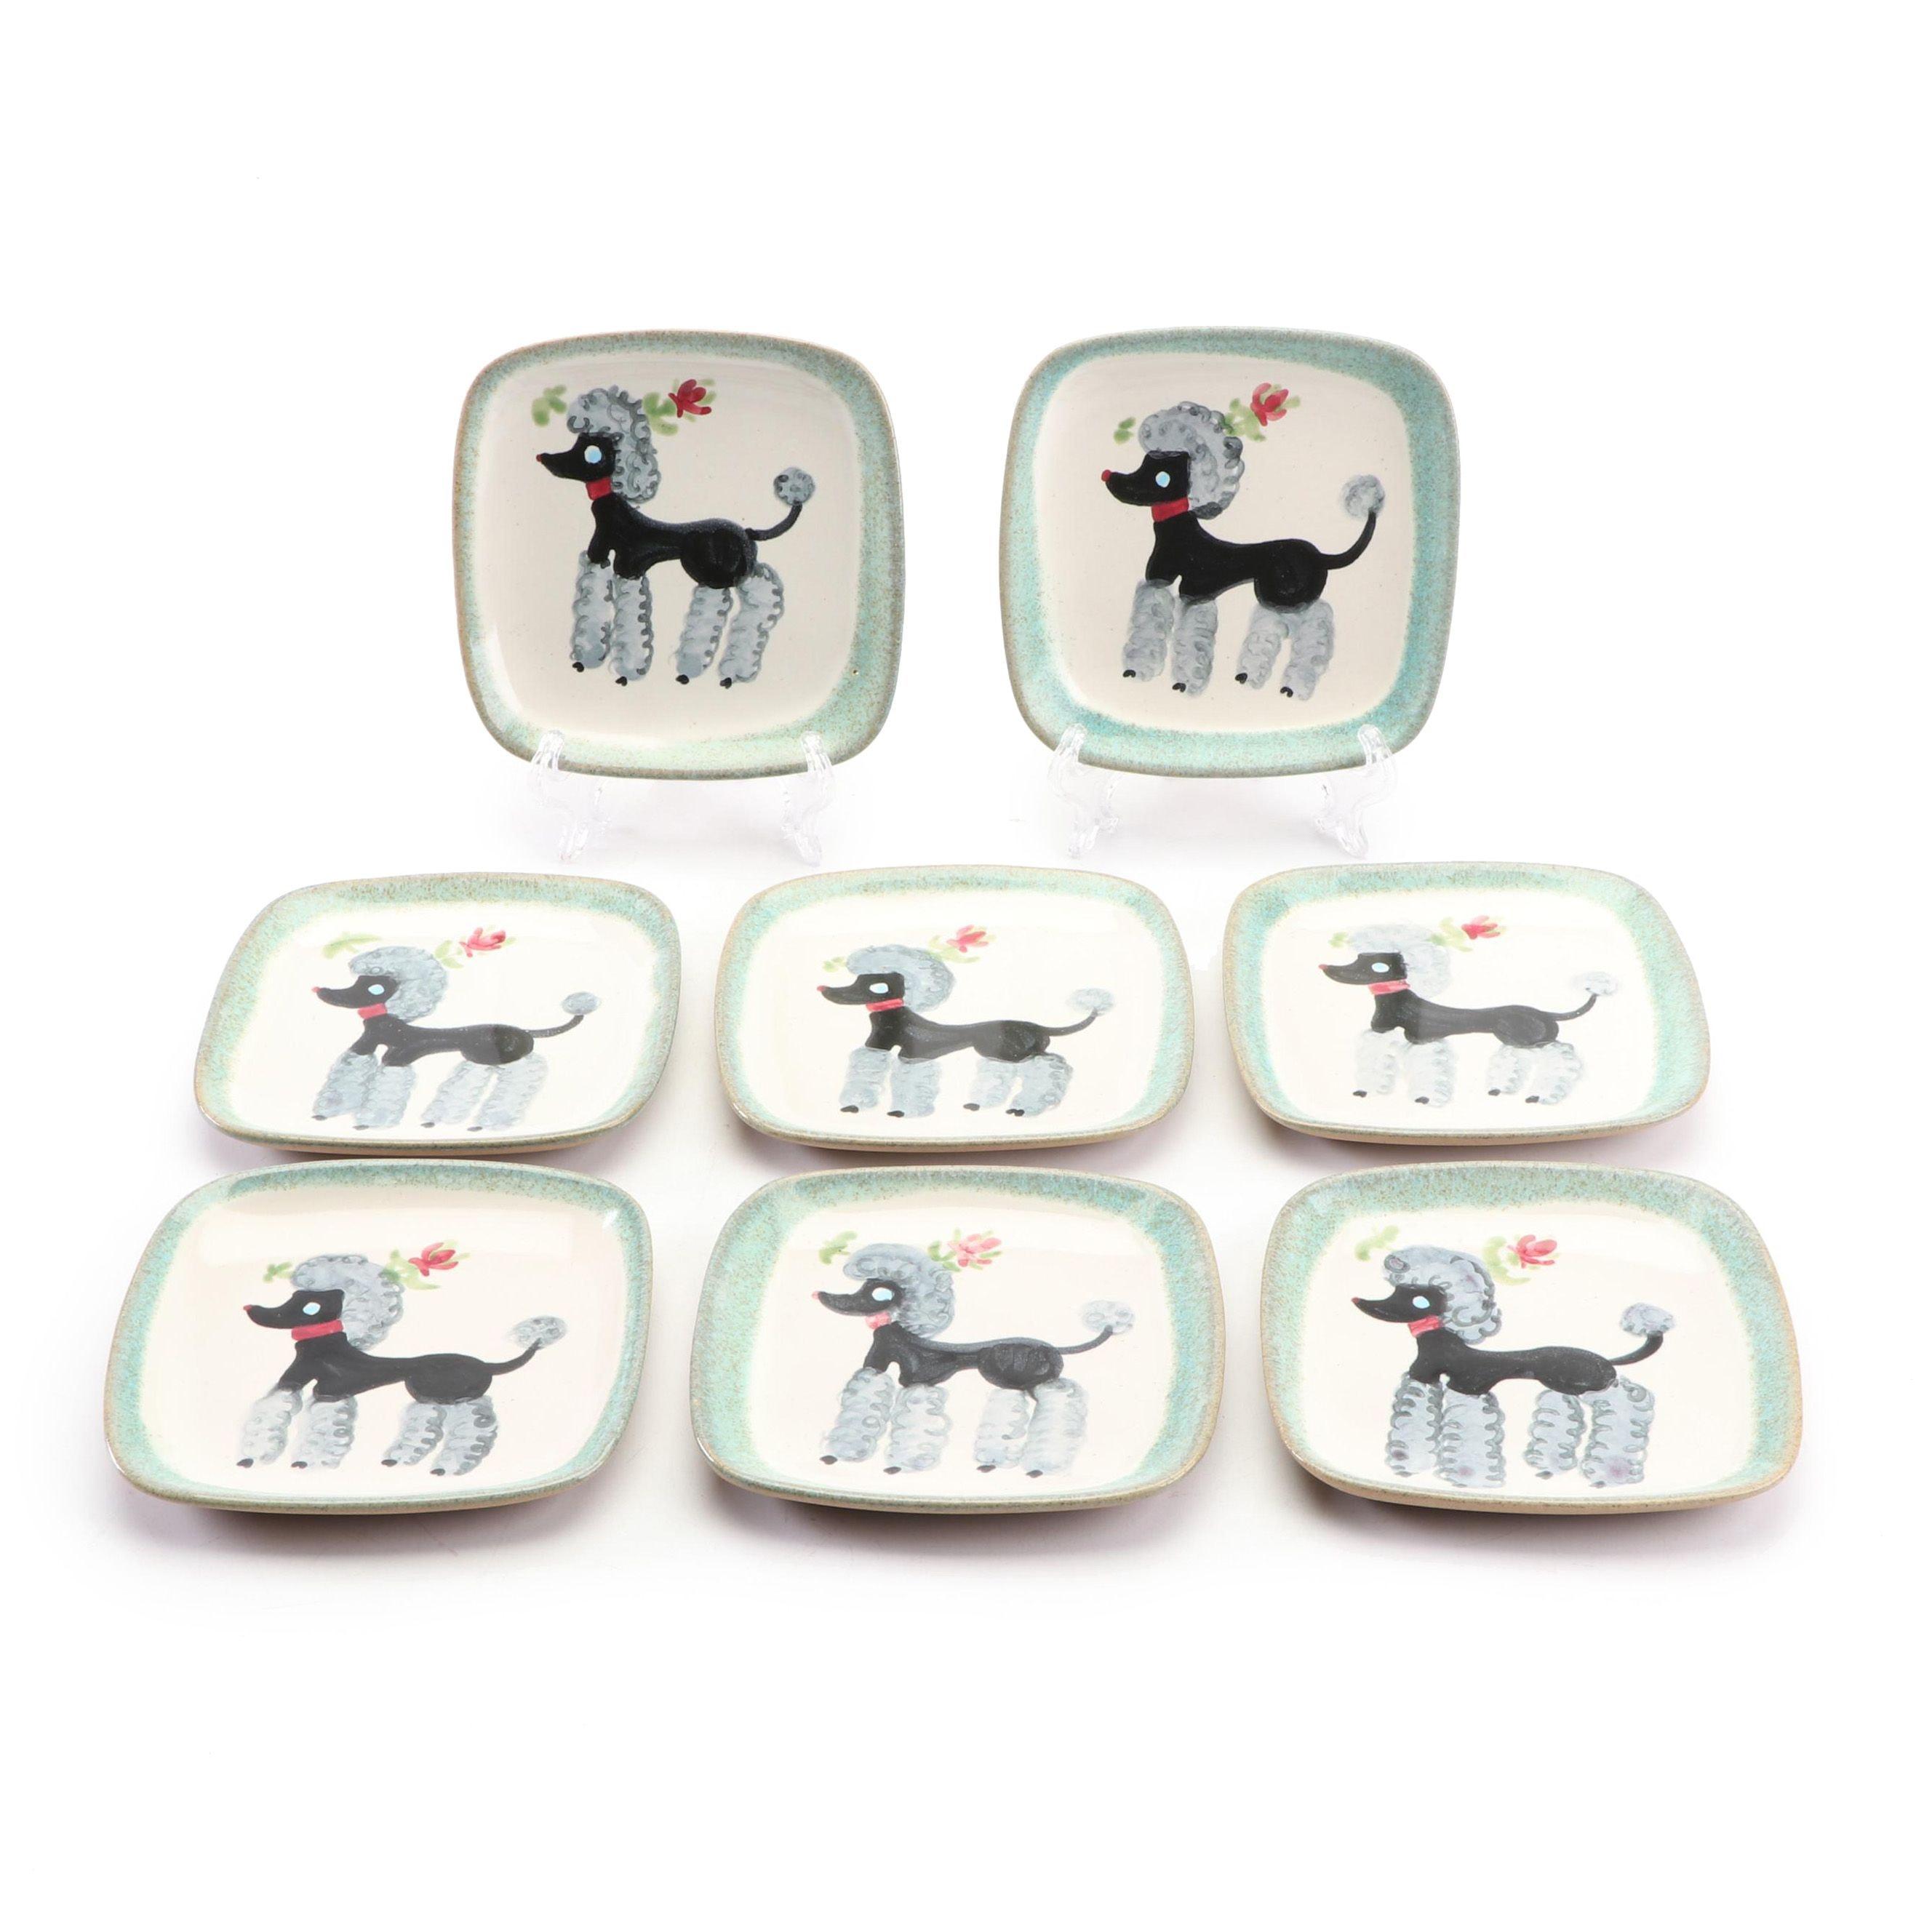 Glidden Poodle Ceramic Plates, Mid-Century